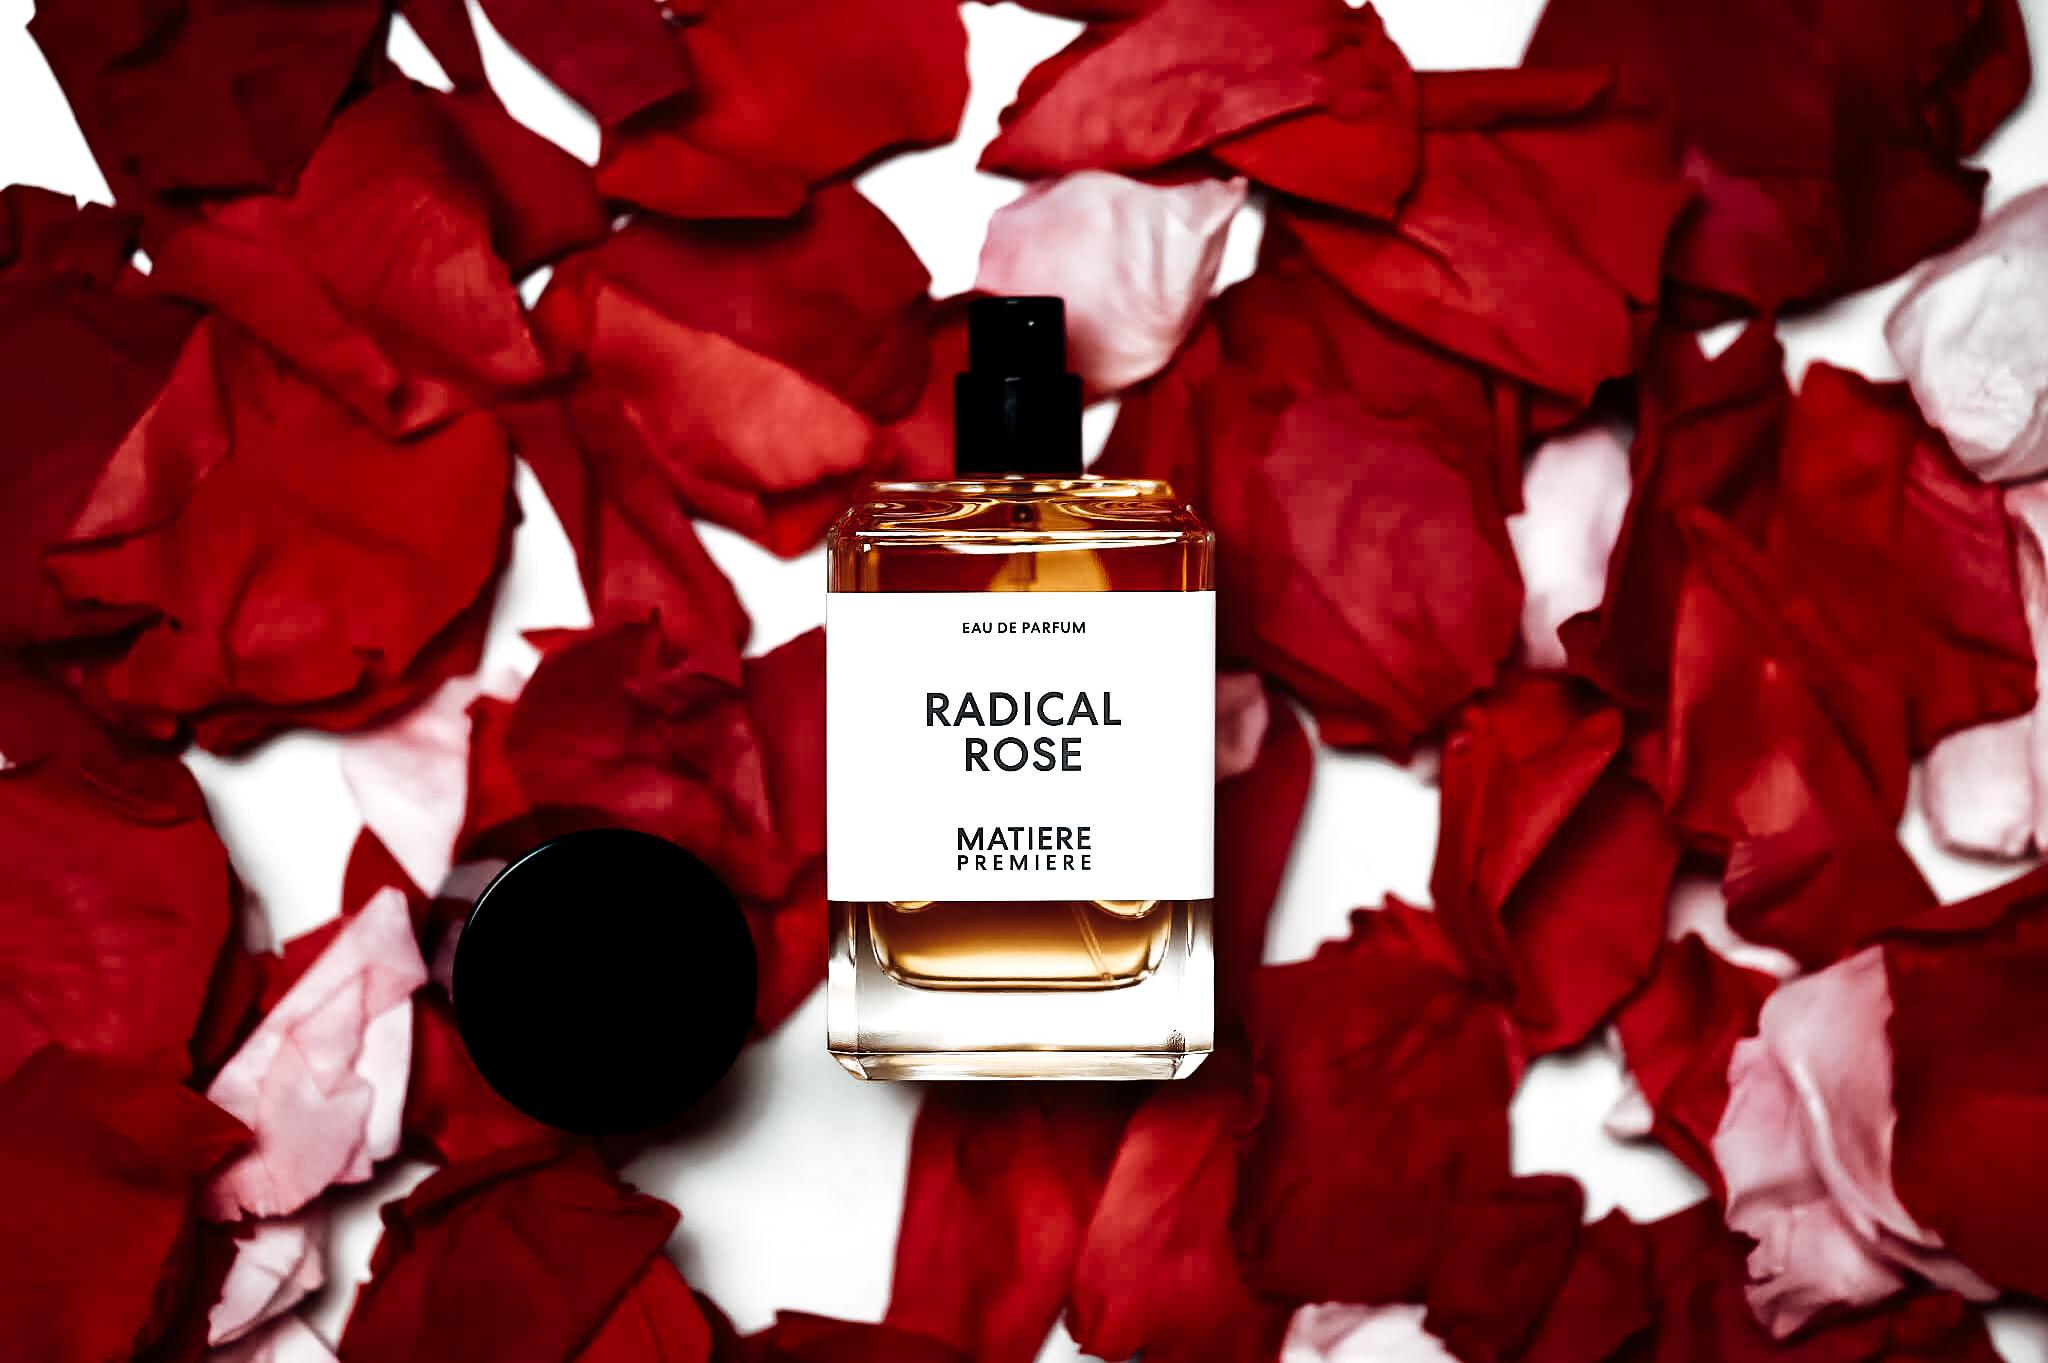 Matière Première Radical Rose